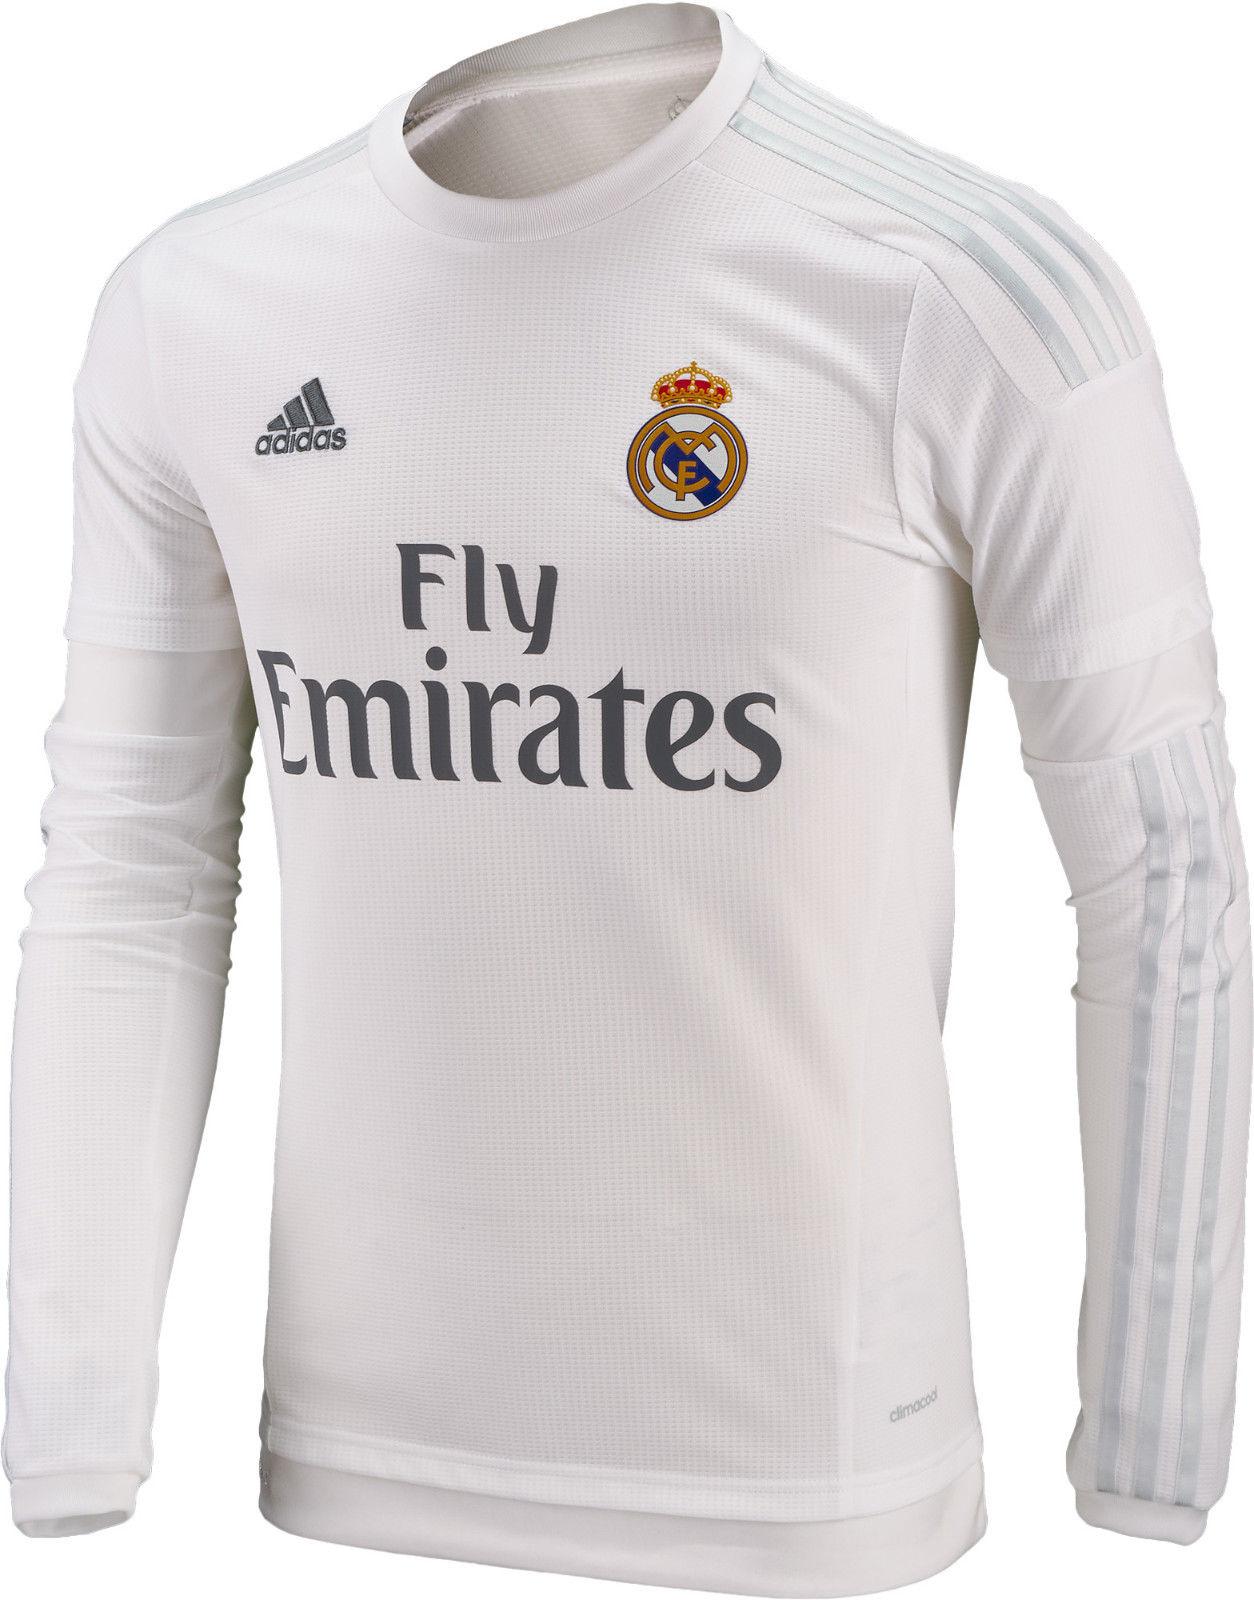 Real Madrid Trikot Größe XS S M L XL XXXL Ronaldo Kroos Sergio Ramos Beflockung